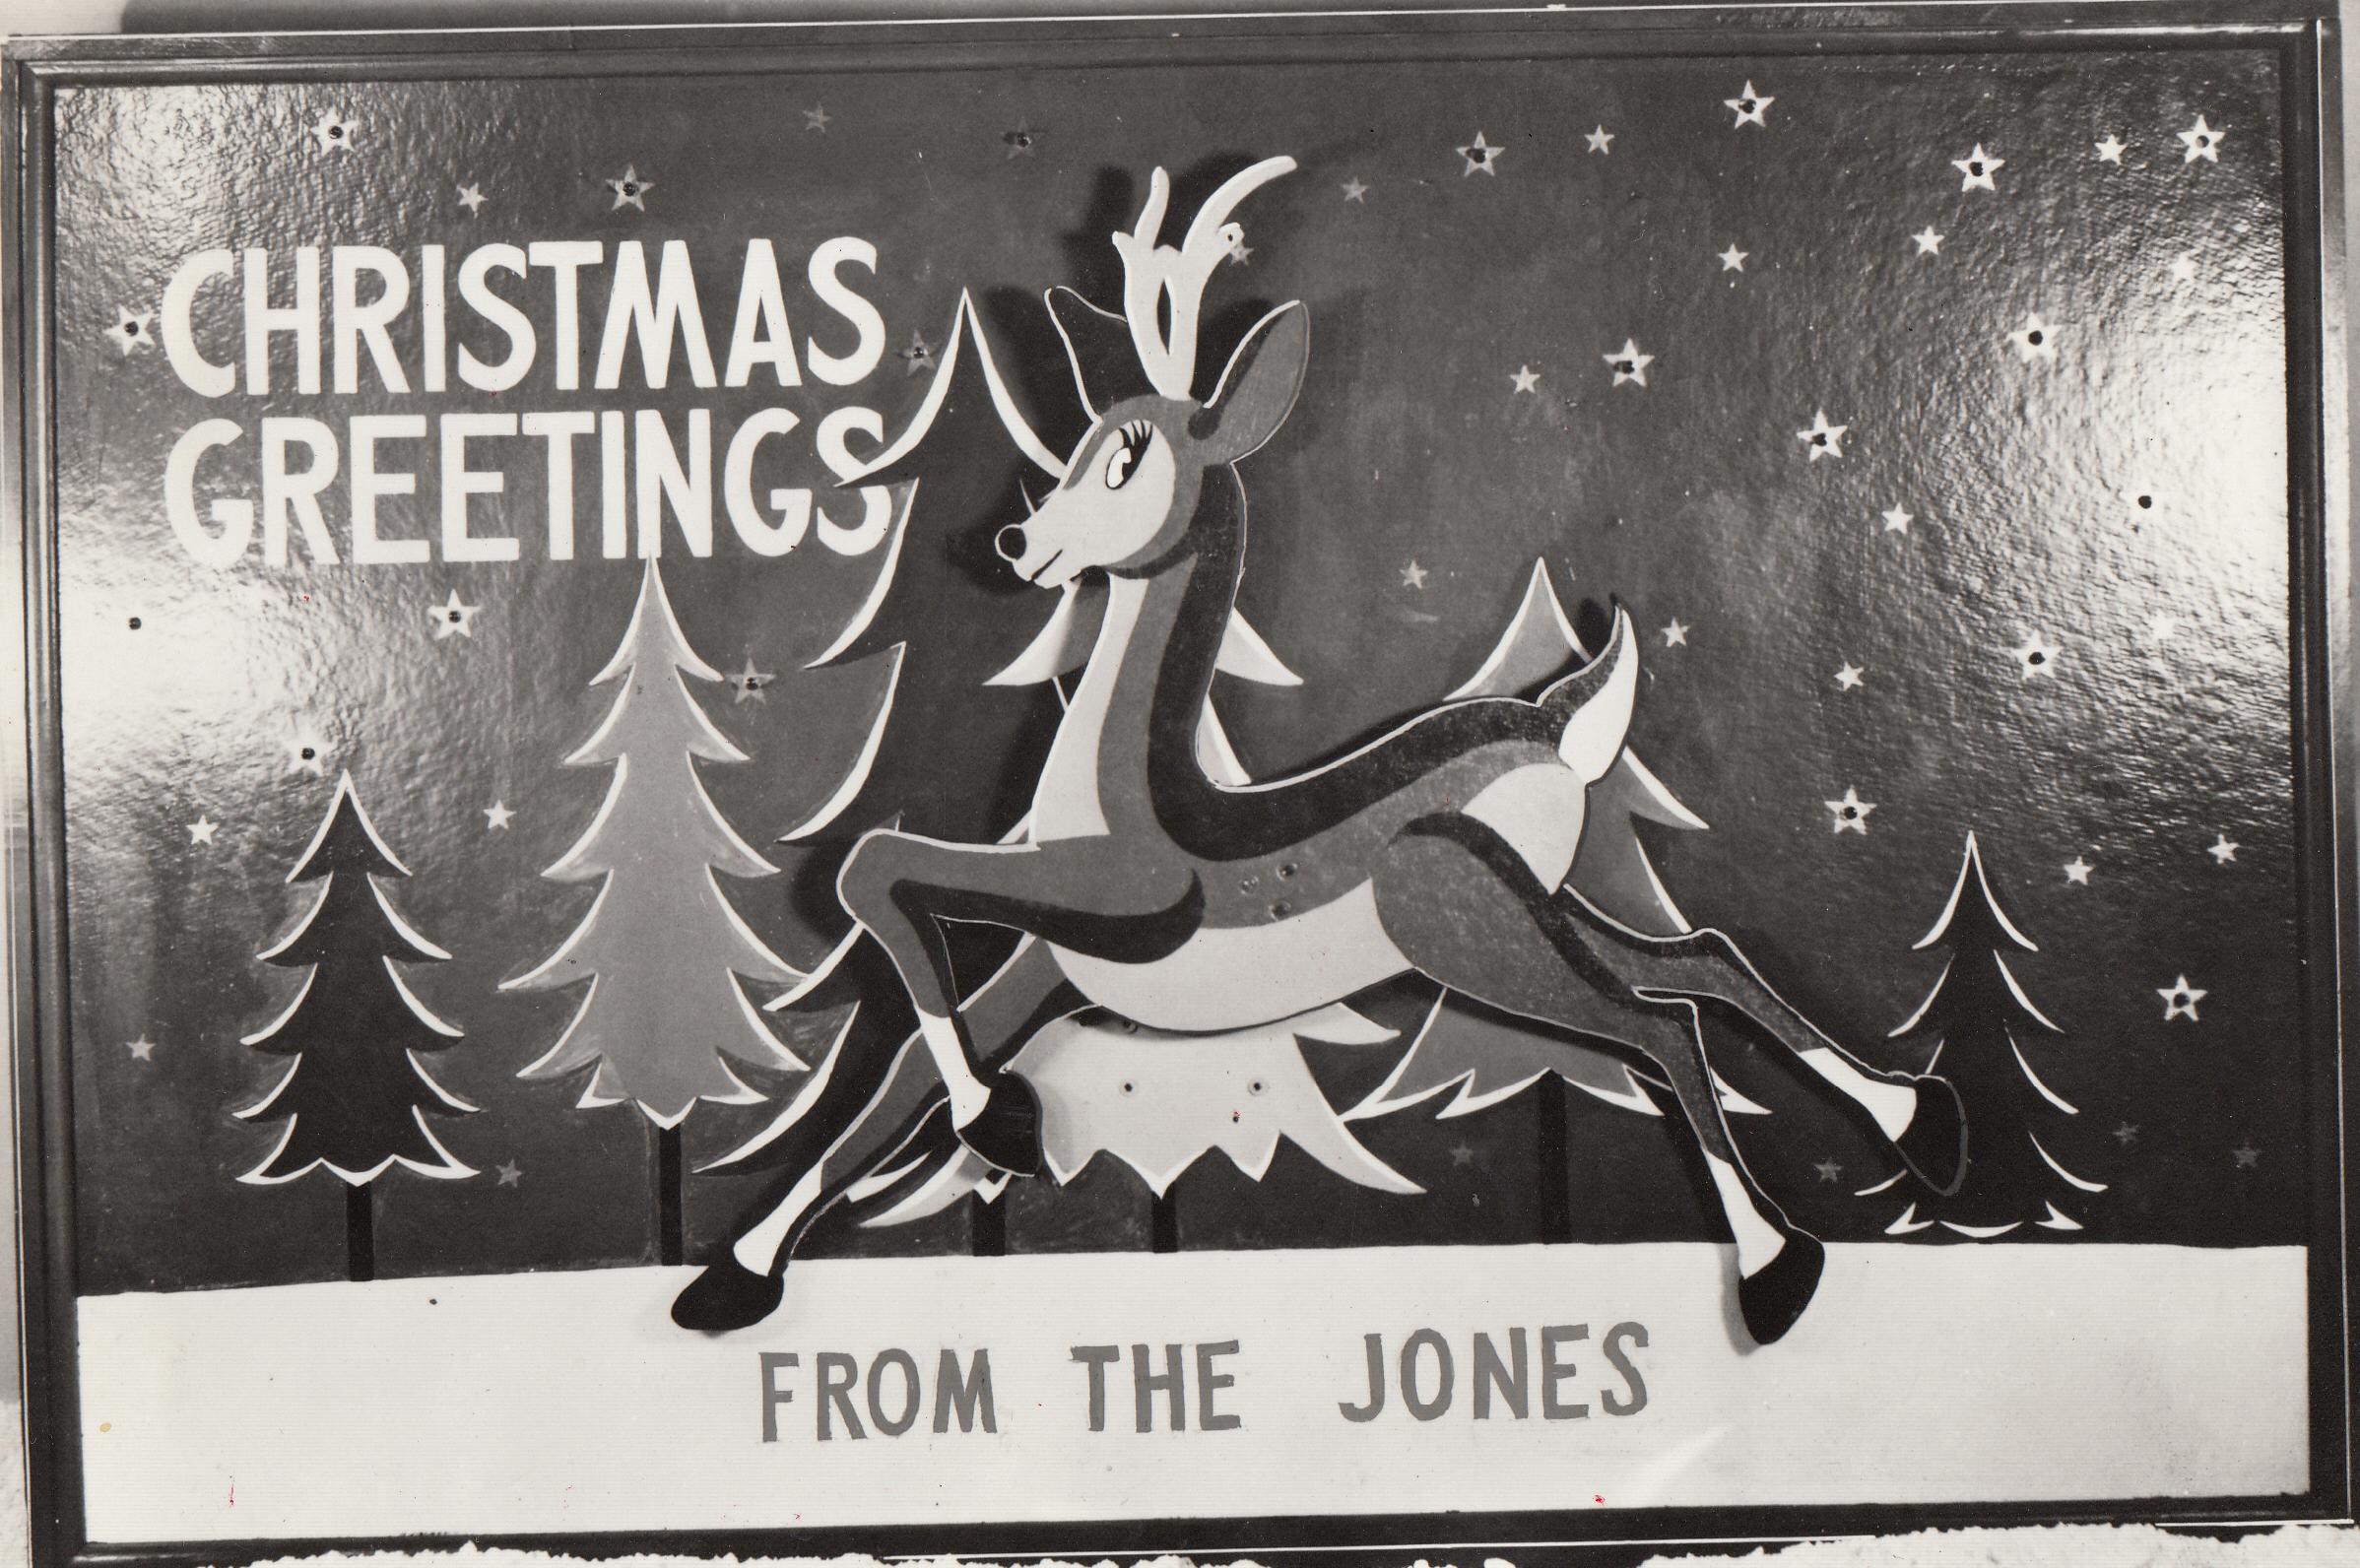 Monochrome holiday card